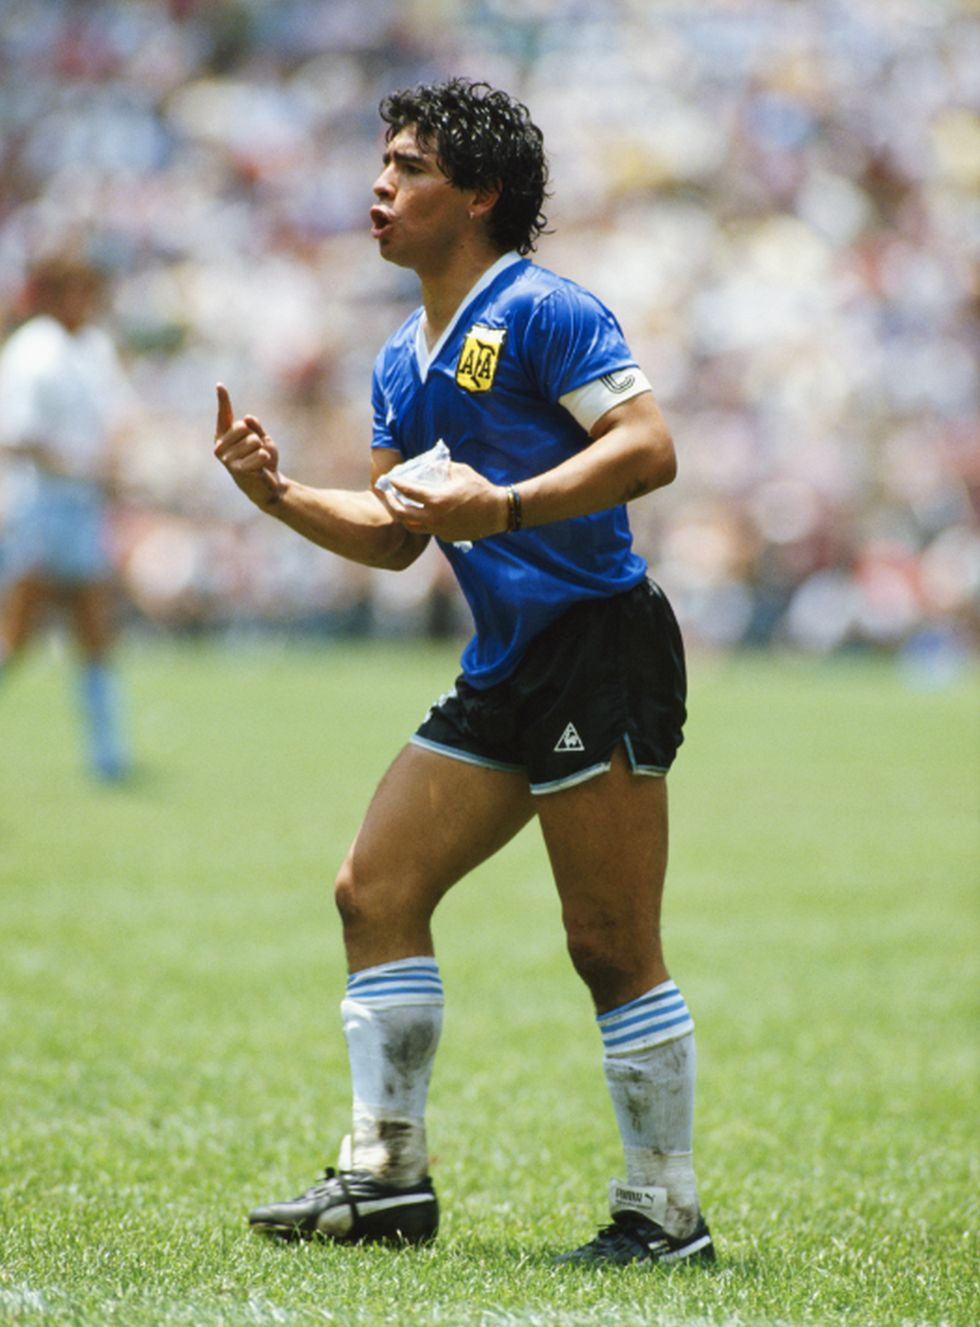 Diego Armando Maradona Wallpapers Sports Hq Diego Armando Maradona Pictures 4k Wallpapers 2019